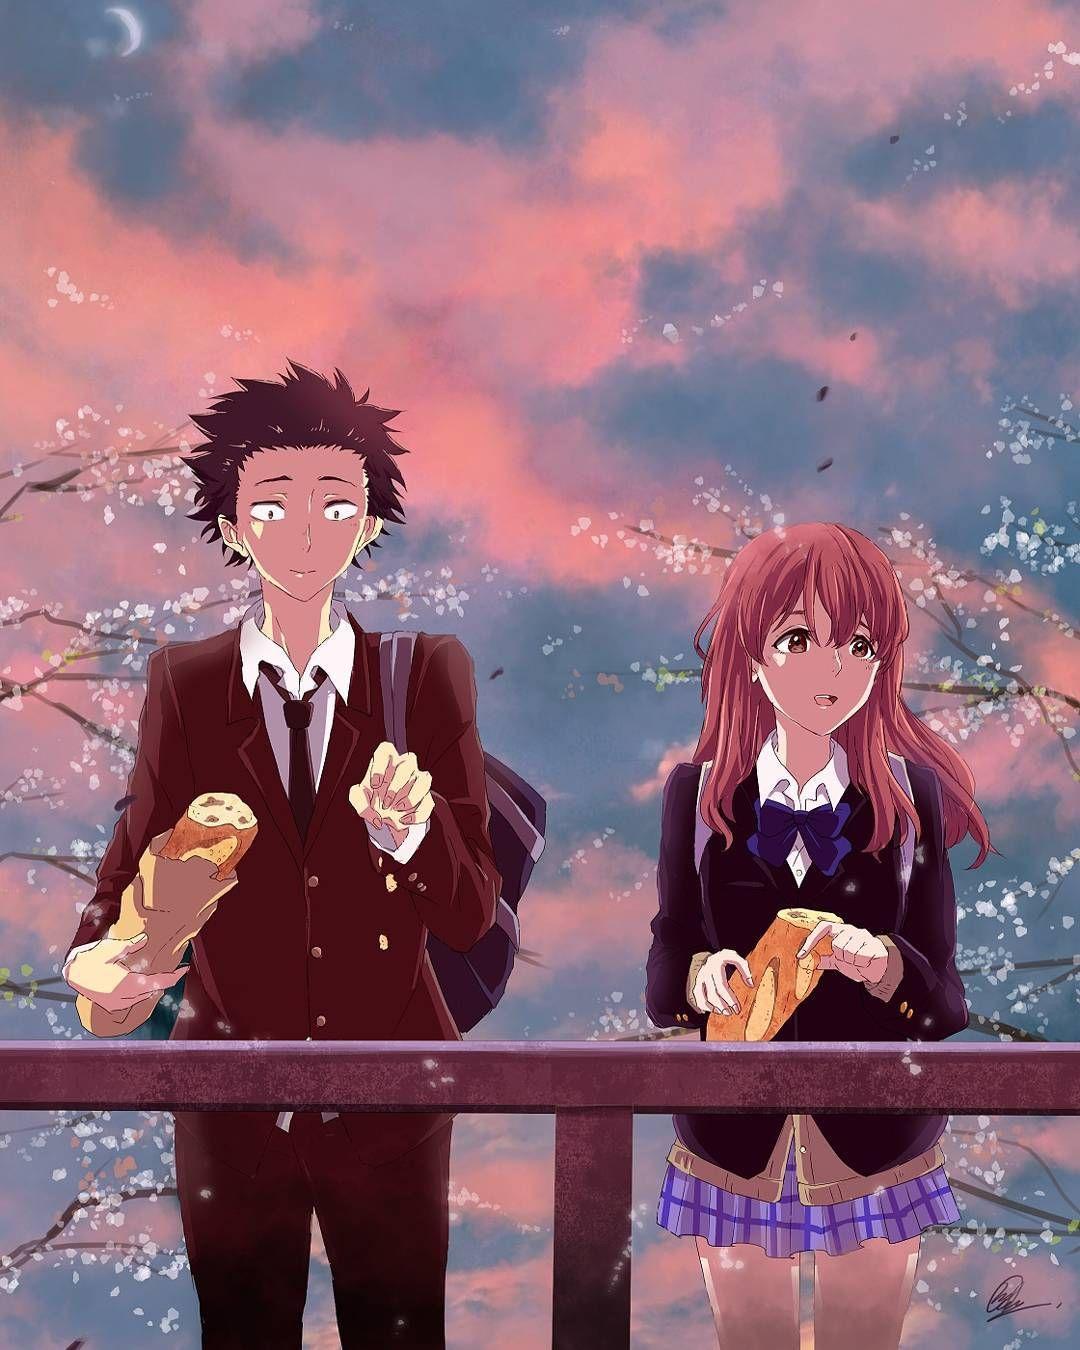 Kawaii Anime Couples  F F C B Pixivs On Instagram Anime Koe No Katachi Characters Boy Shoya Ishida Girl Shoko Nishimiya Artist G Ef Bc Atwitter